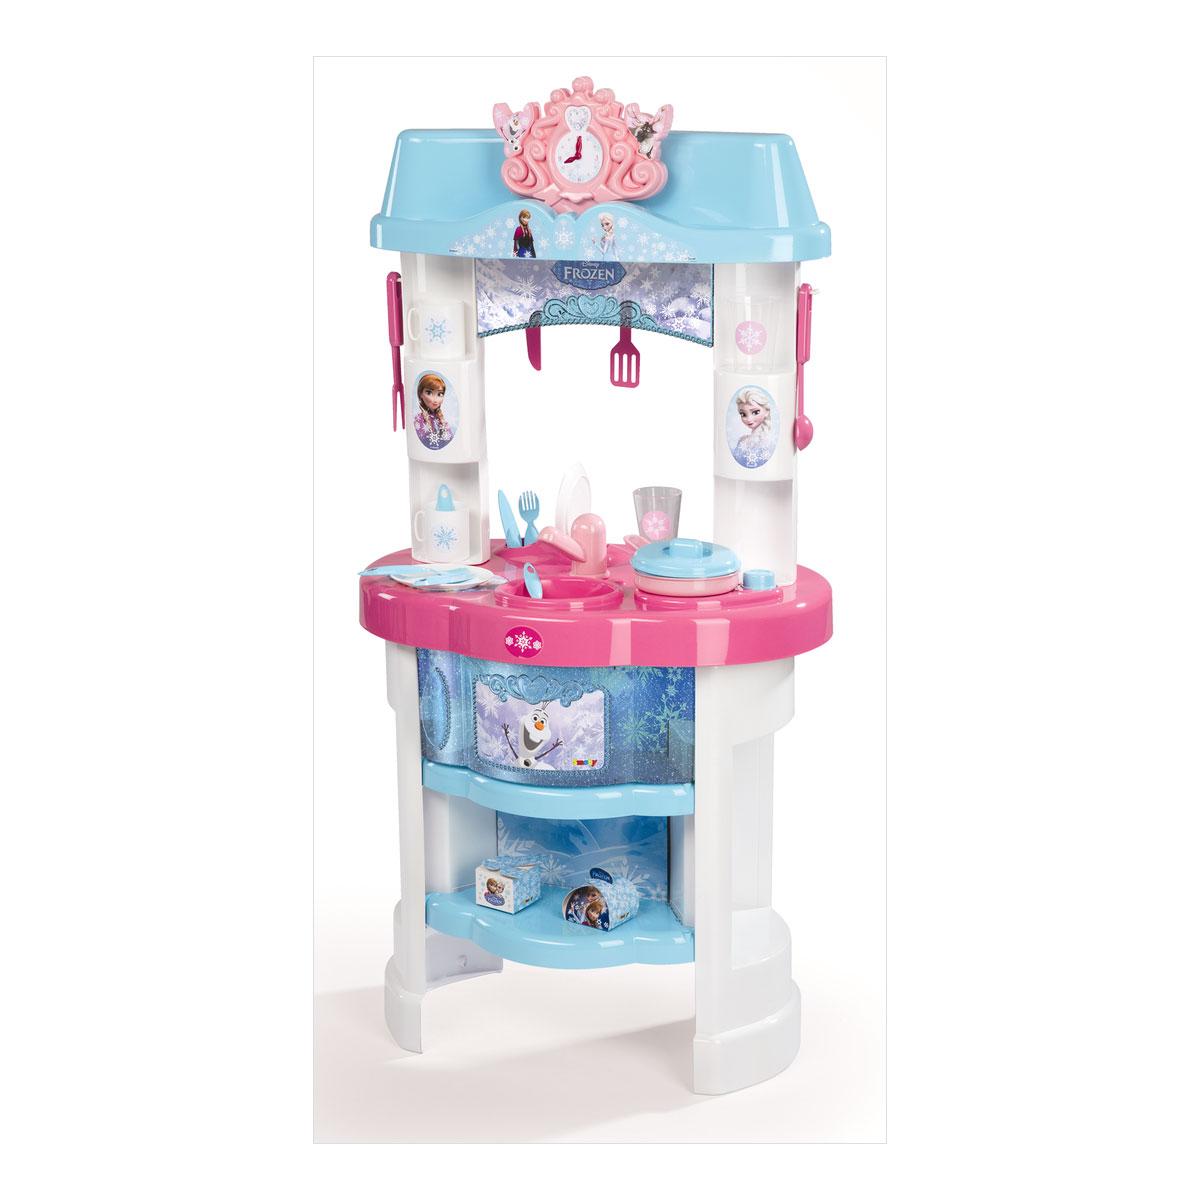 Disney Keukenaccessoires : Smoby Disney Frozen Keuken online kopen Lobbes nl